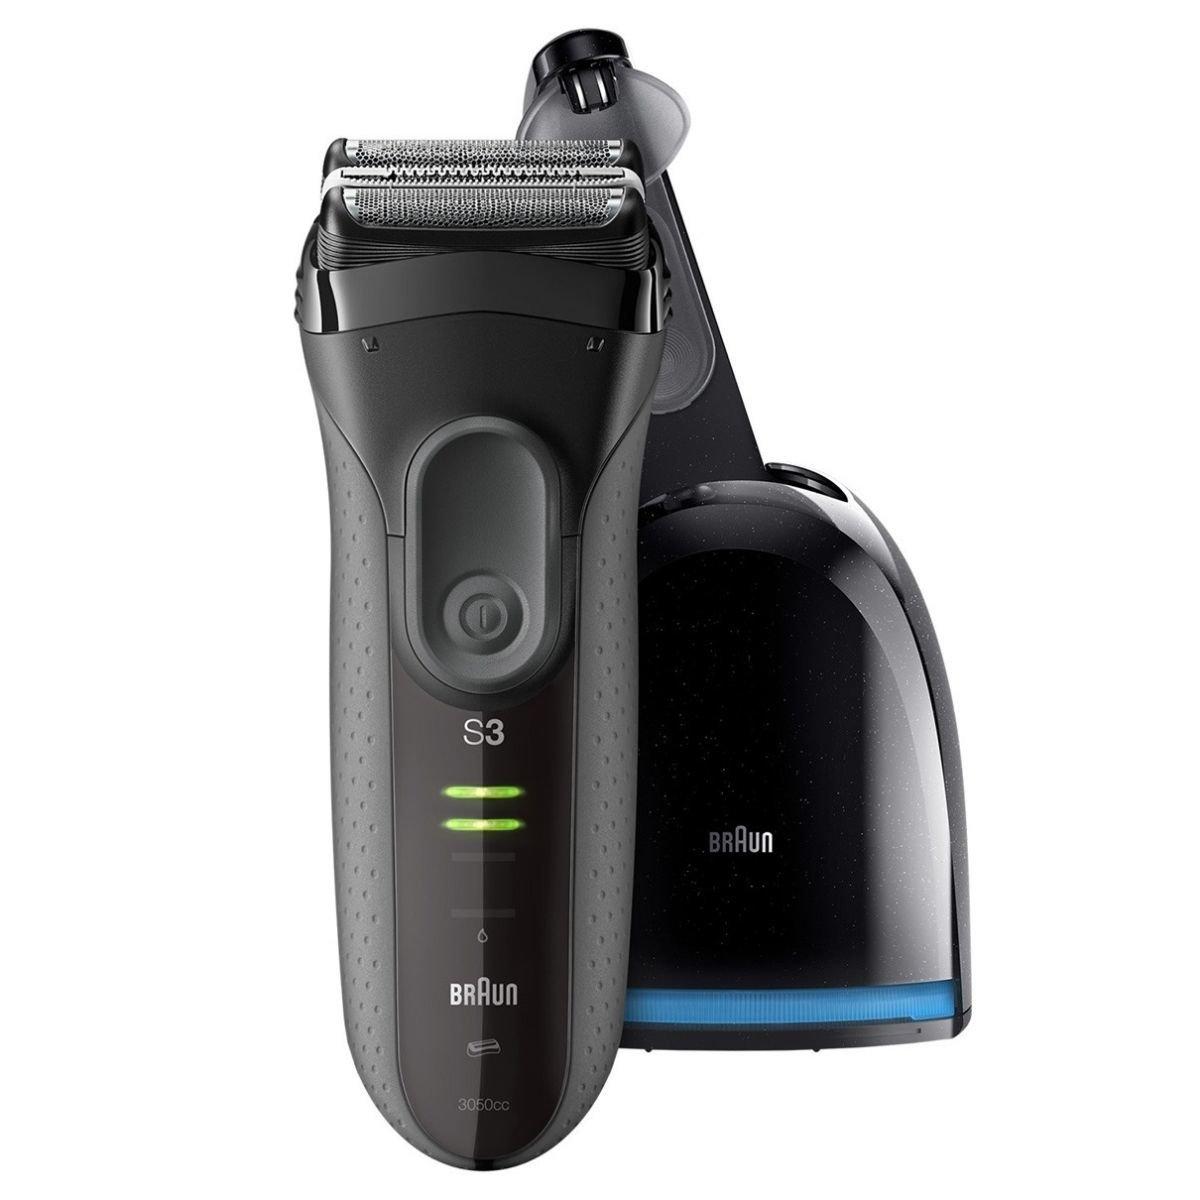 Series 3 ProSkin 親膚系列 3050cc 可充電電鬚刨(灰色)帶有清潔充電系統